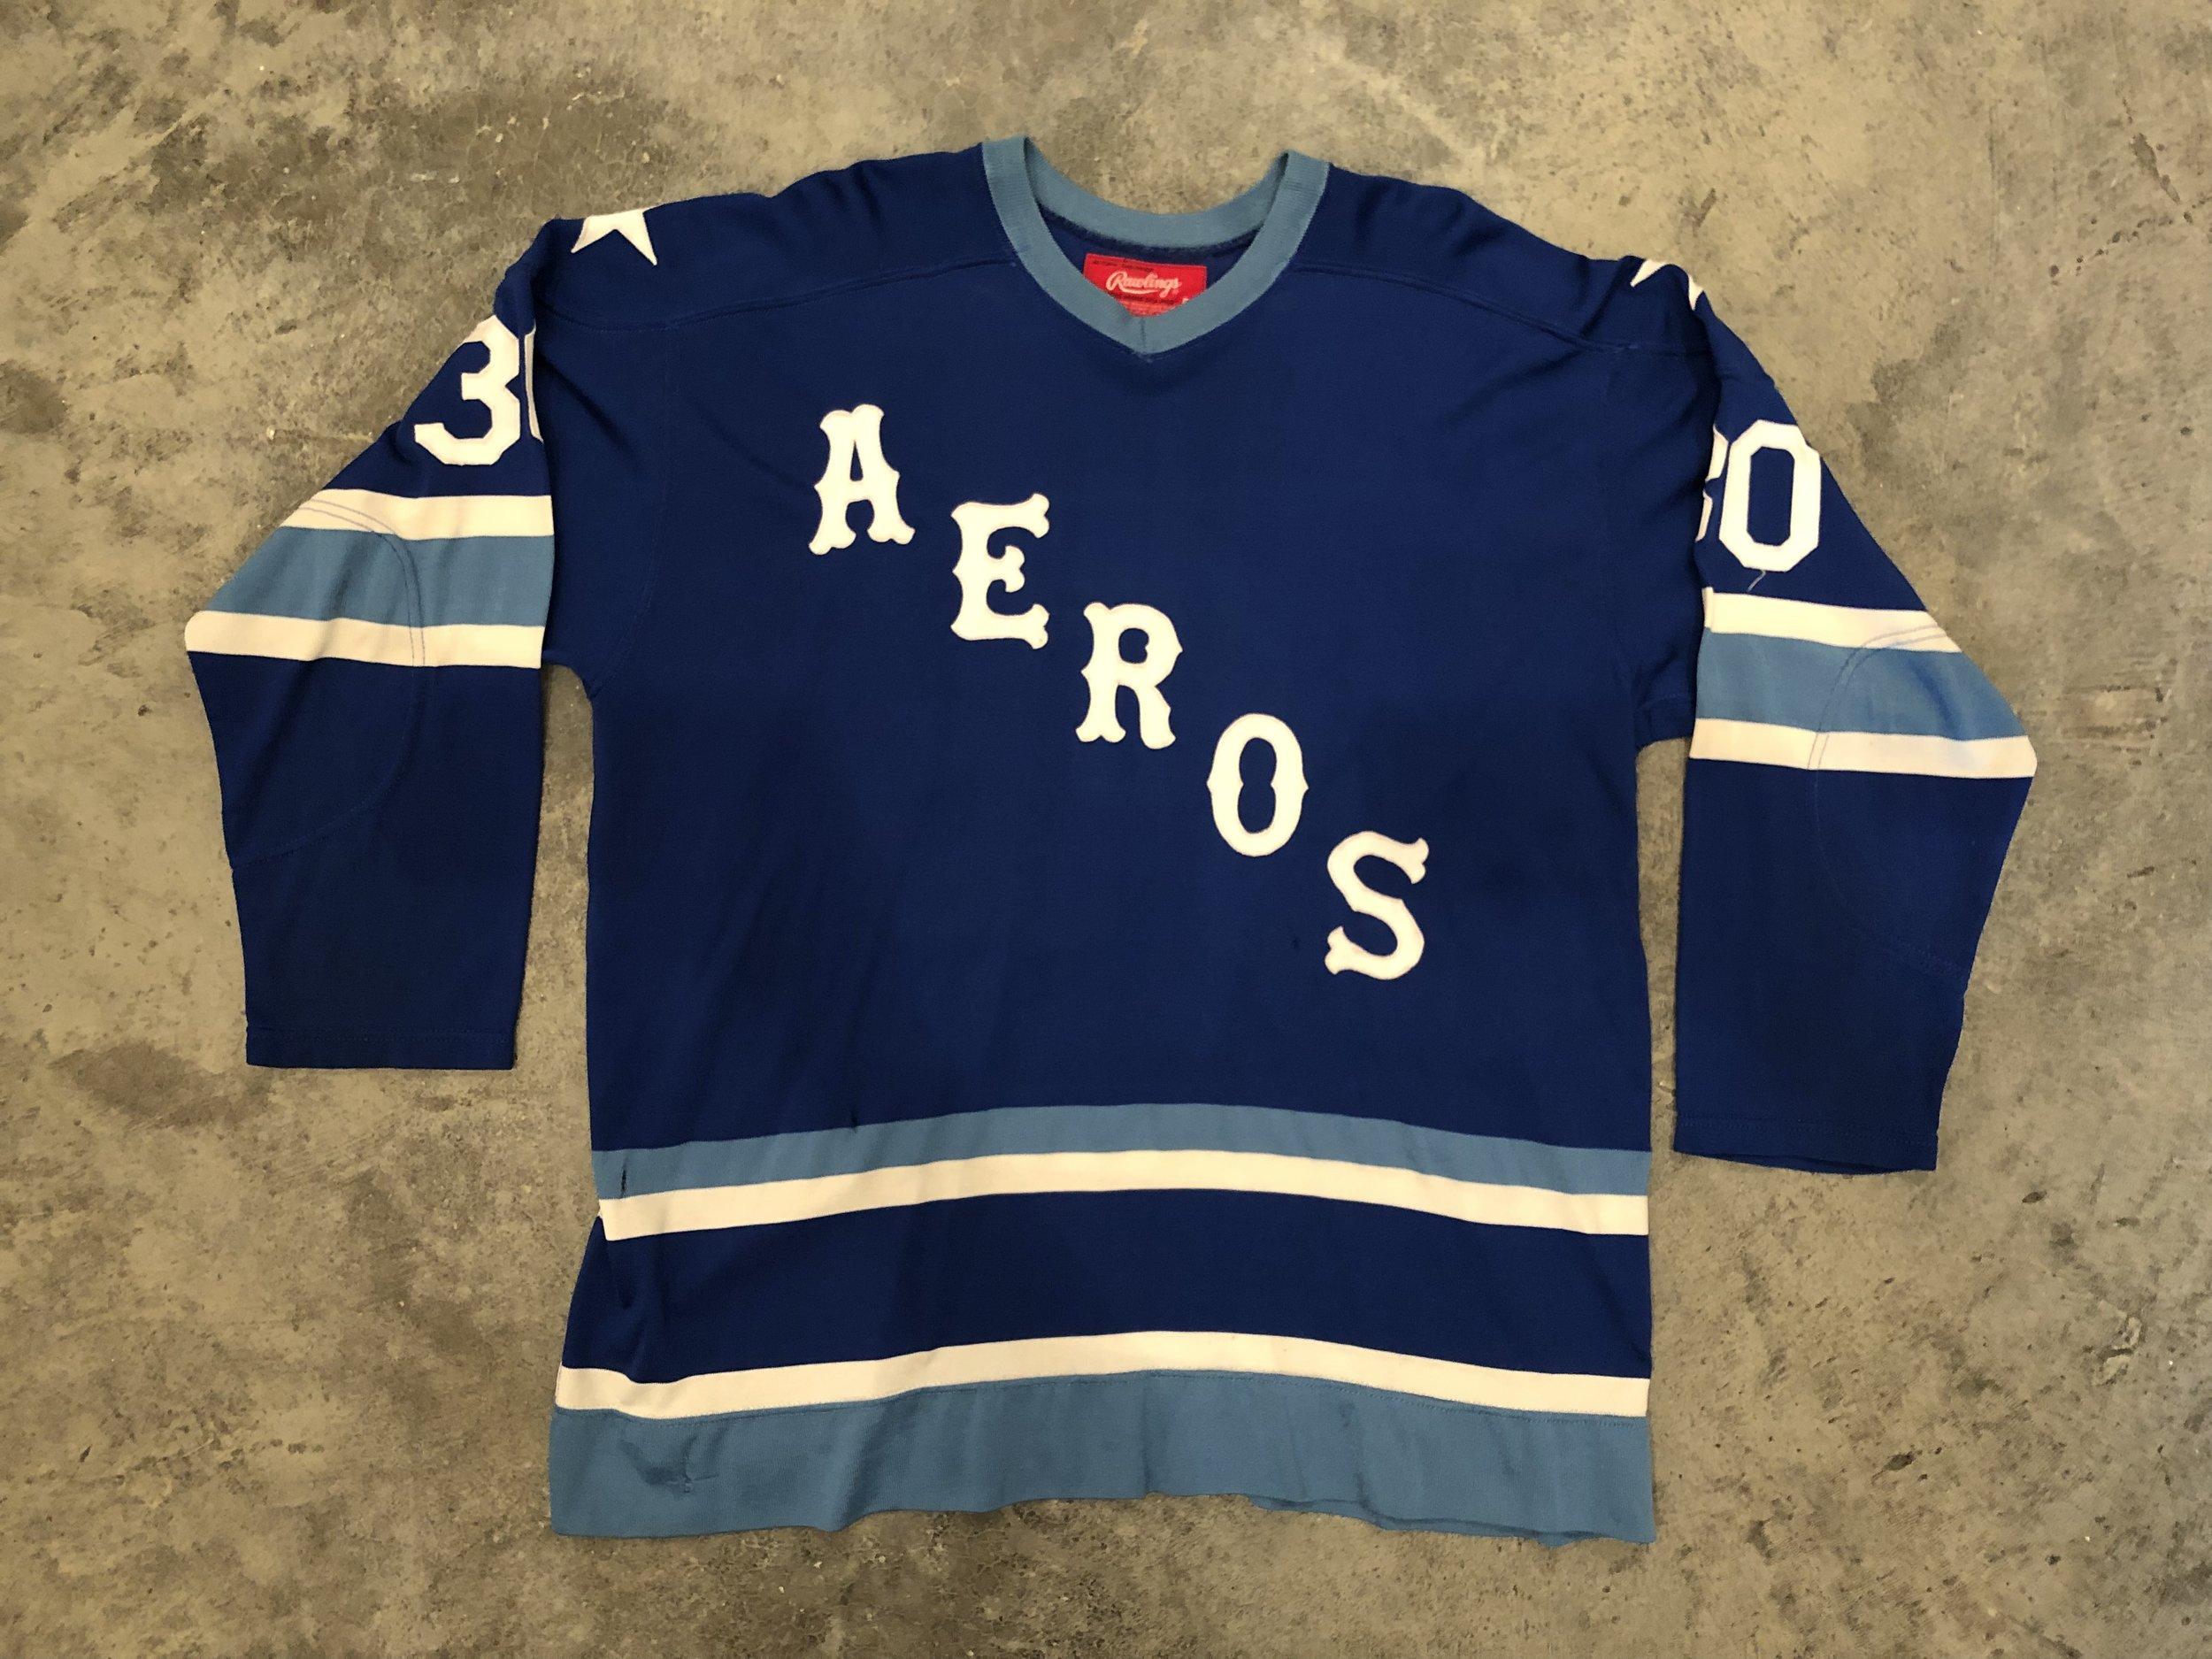 1974-75 Wayne Rutledge Houston Aeros game worn road jersey